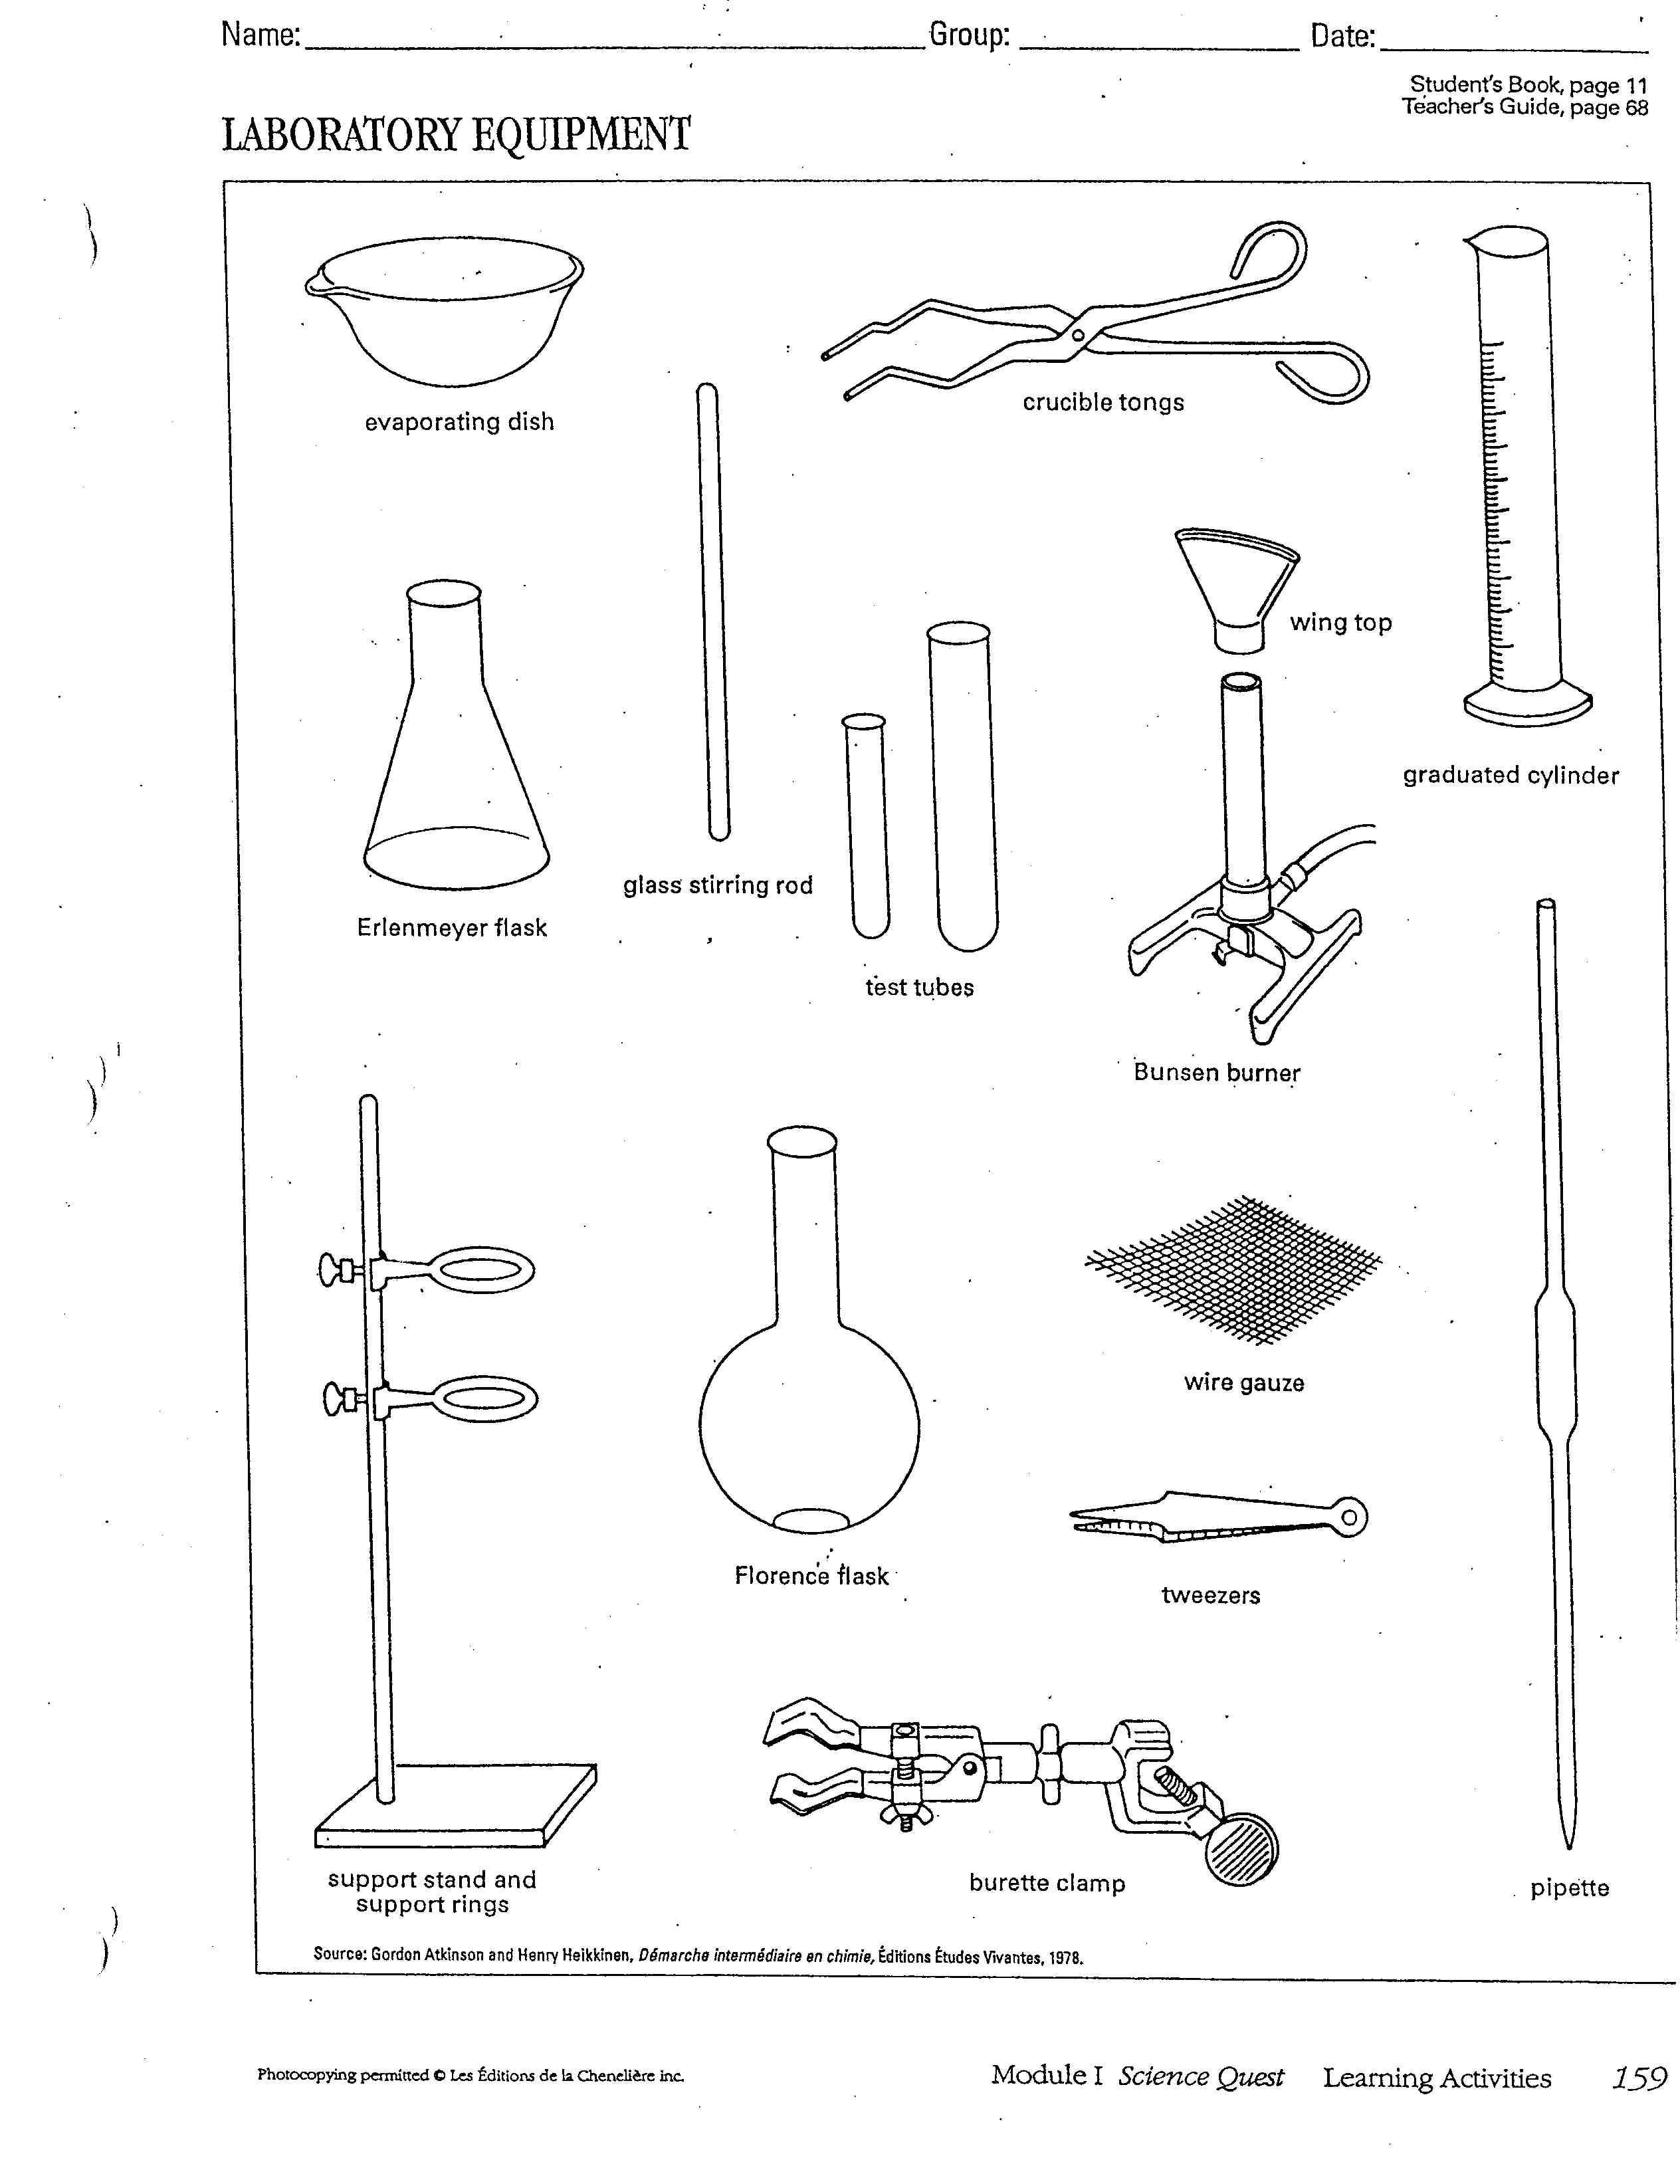 Chemistry Lab Equipment Worksheets